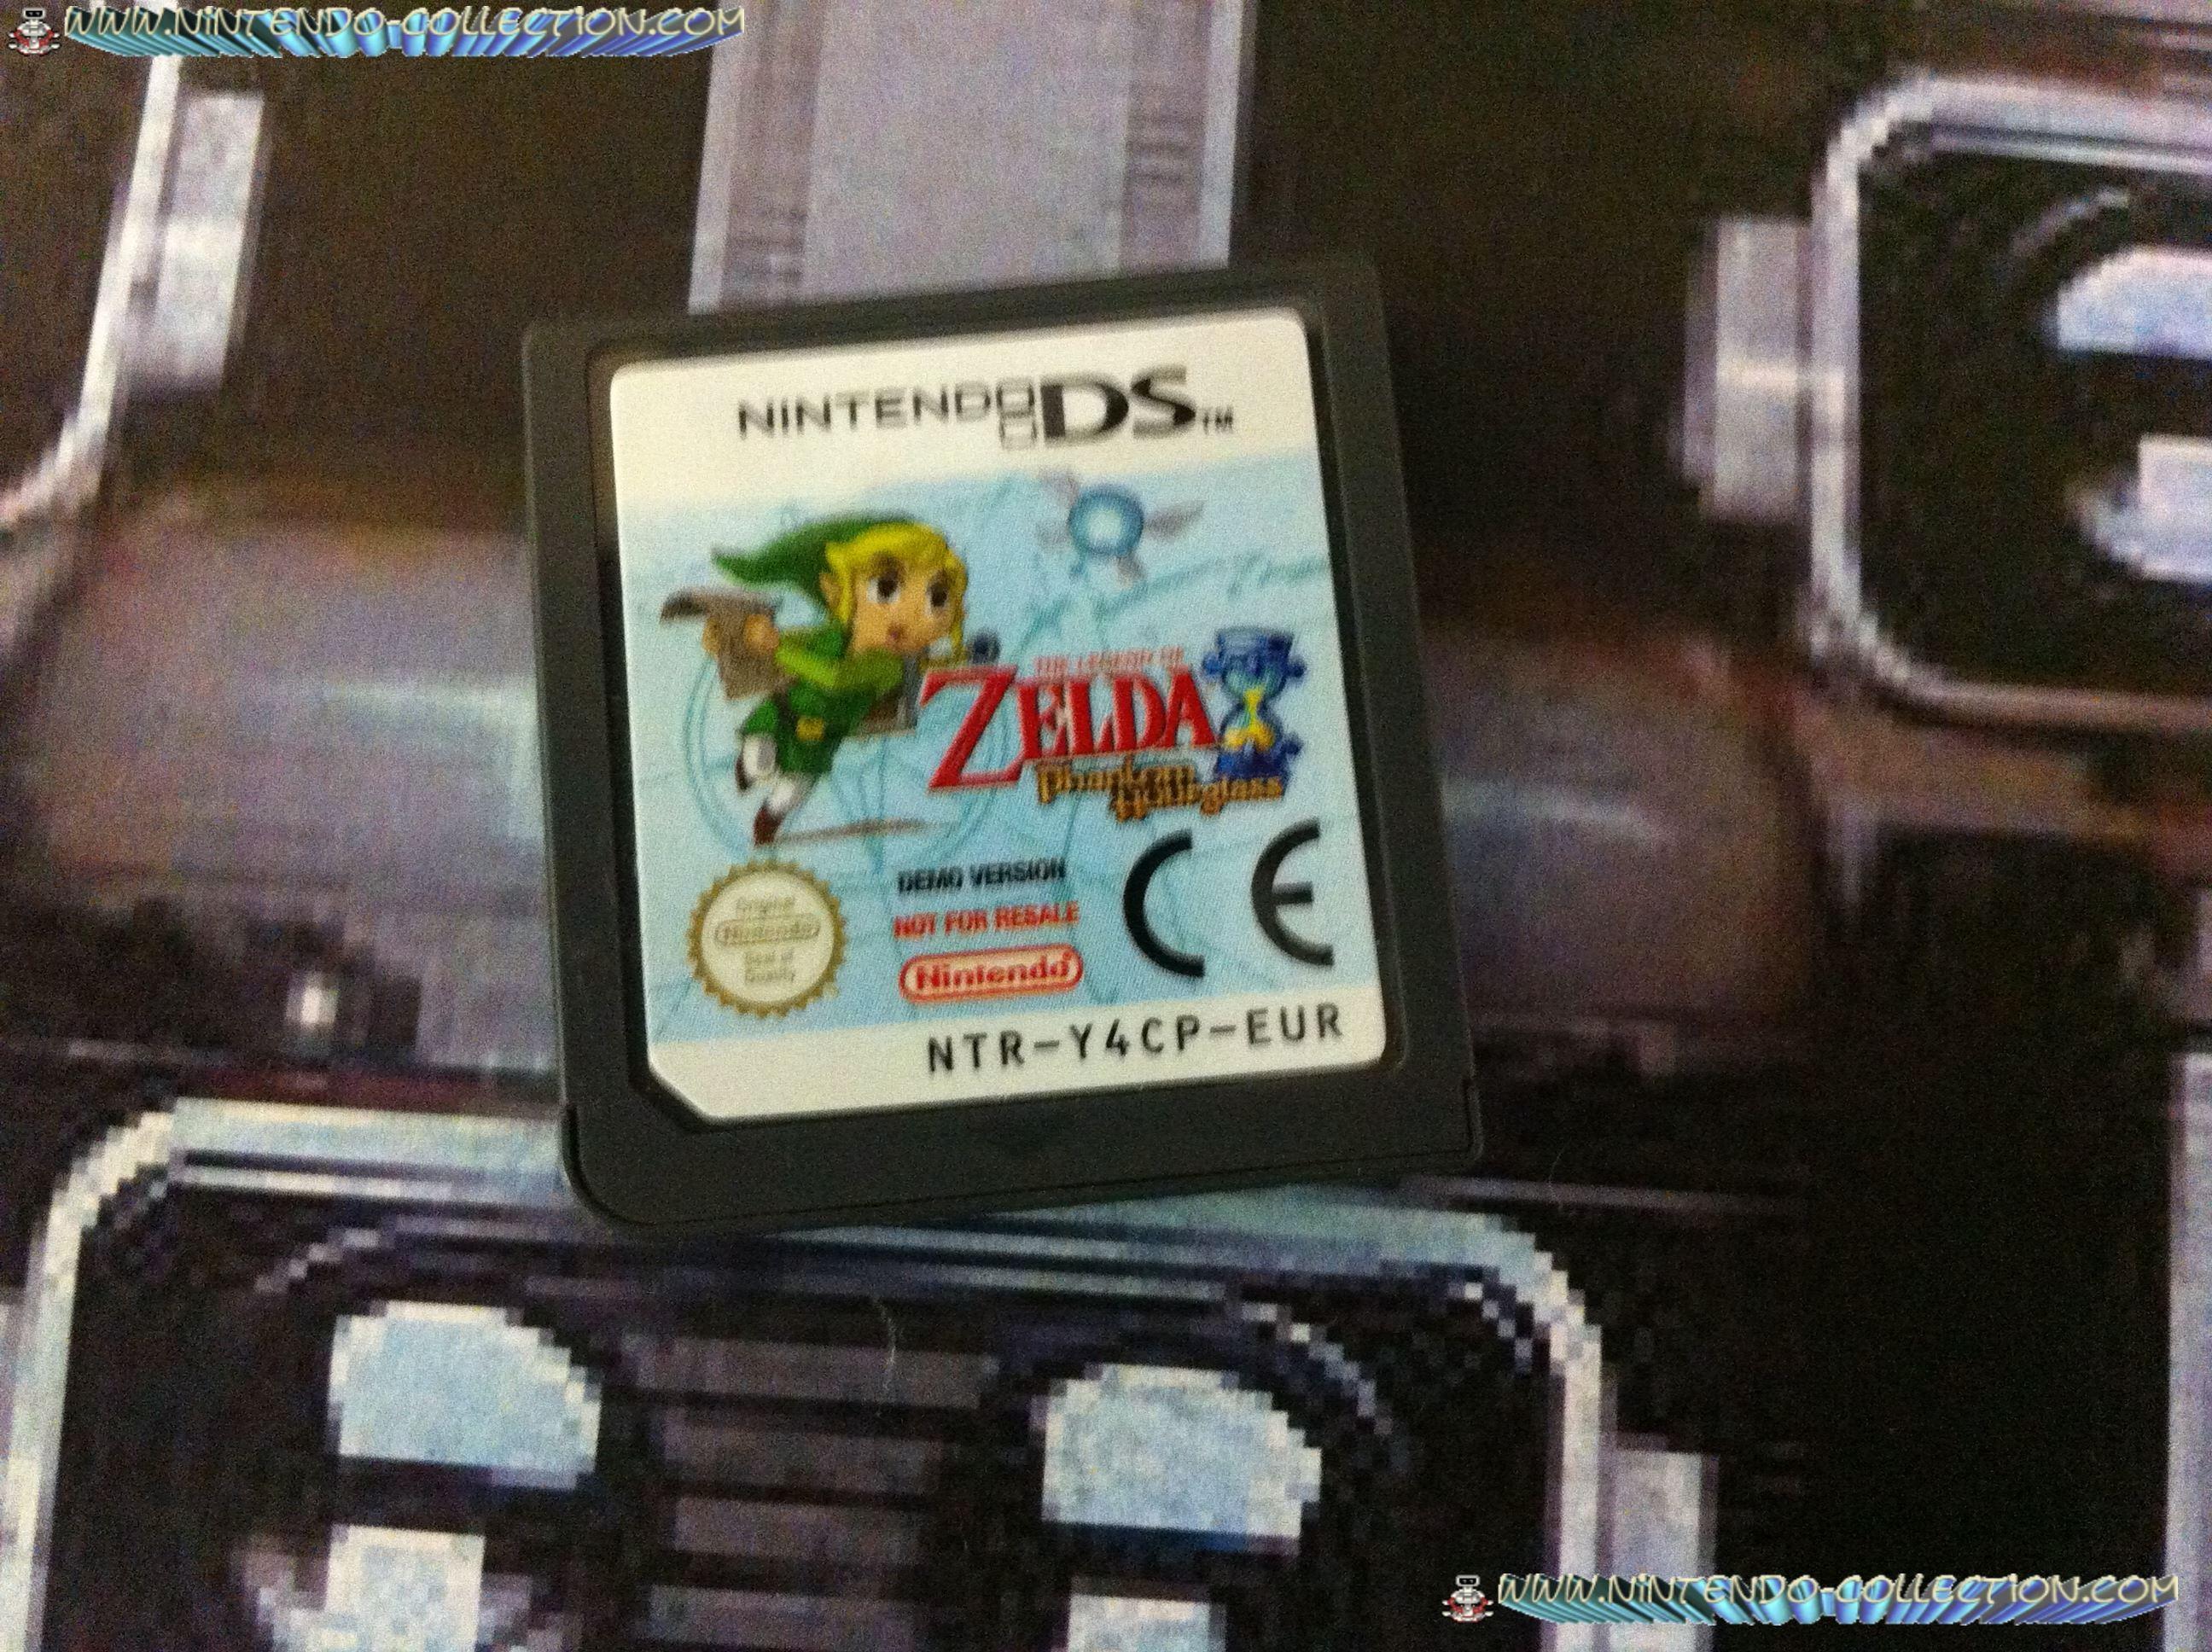 www.nintendo-collection.com - Demo DS 3 DS - Not For Resale - Zelda Phantom Hourglass